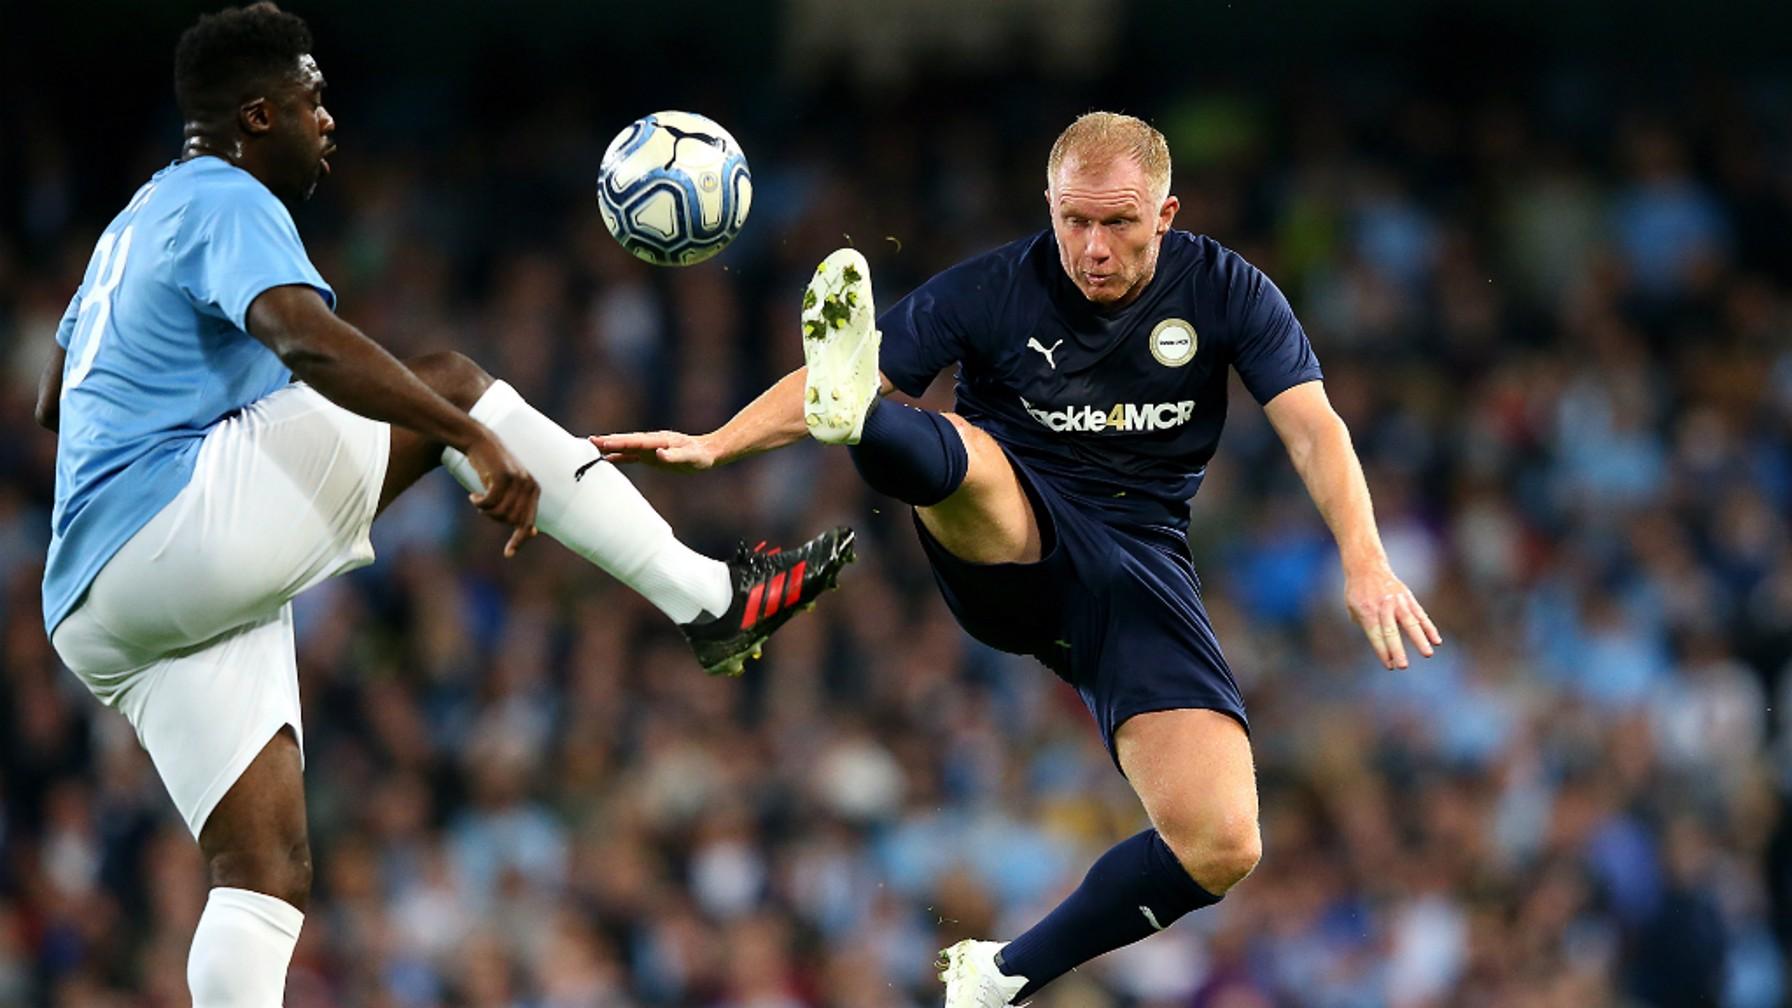 AERIAL BATTLE: Kolo Toure leaps alongside Paul Scholes to win possession